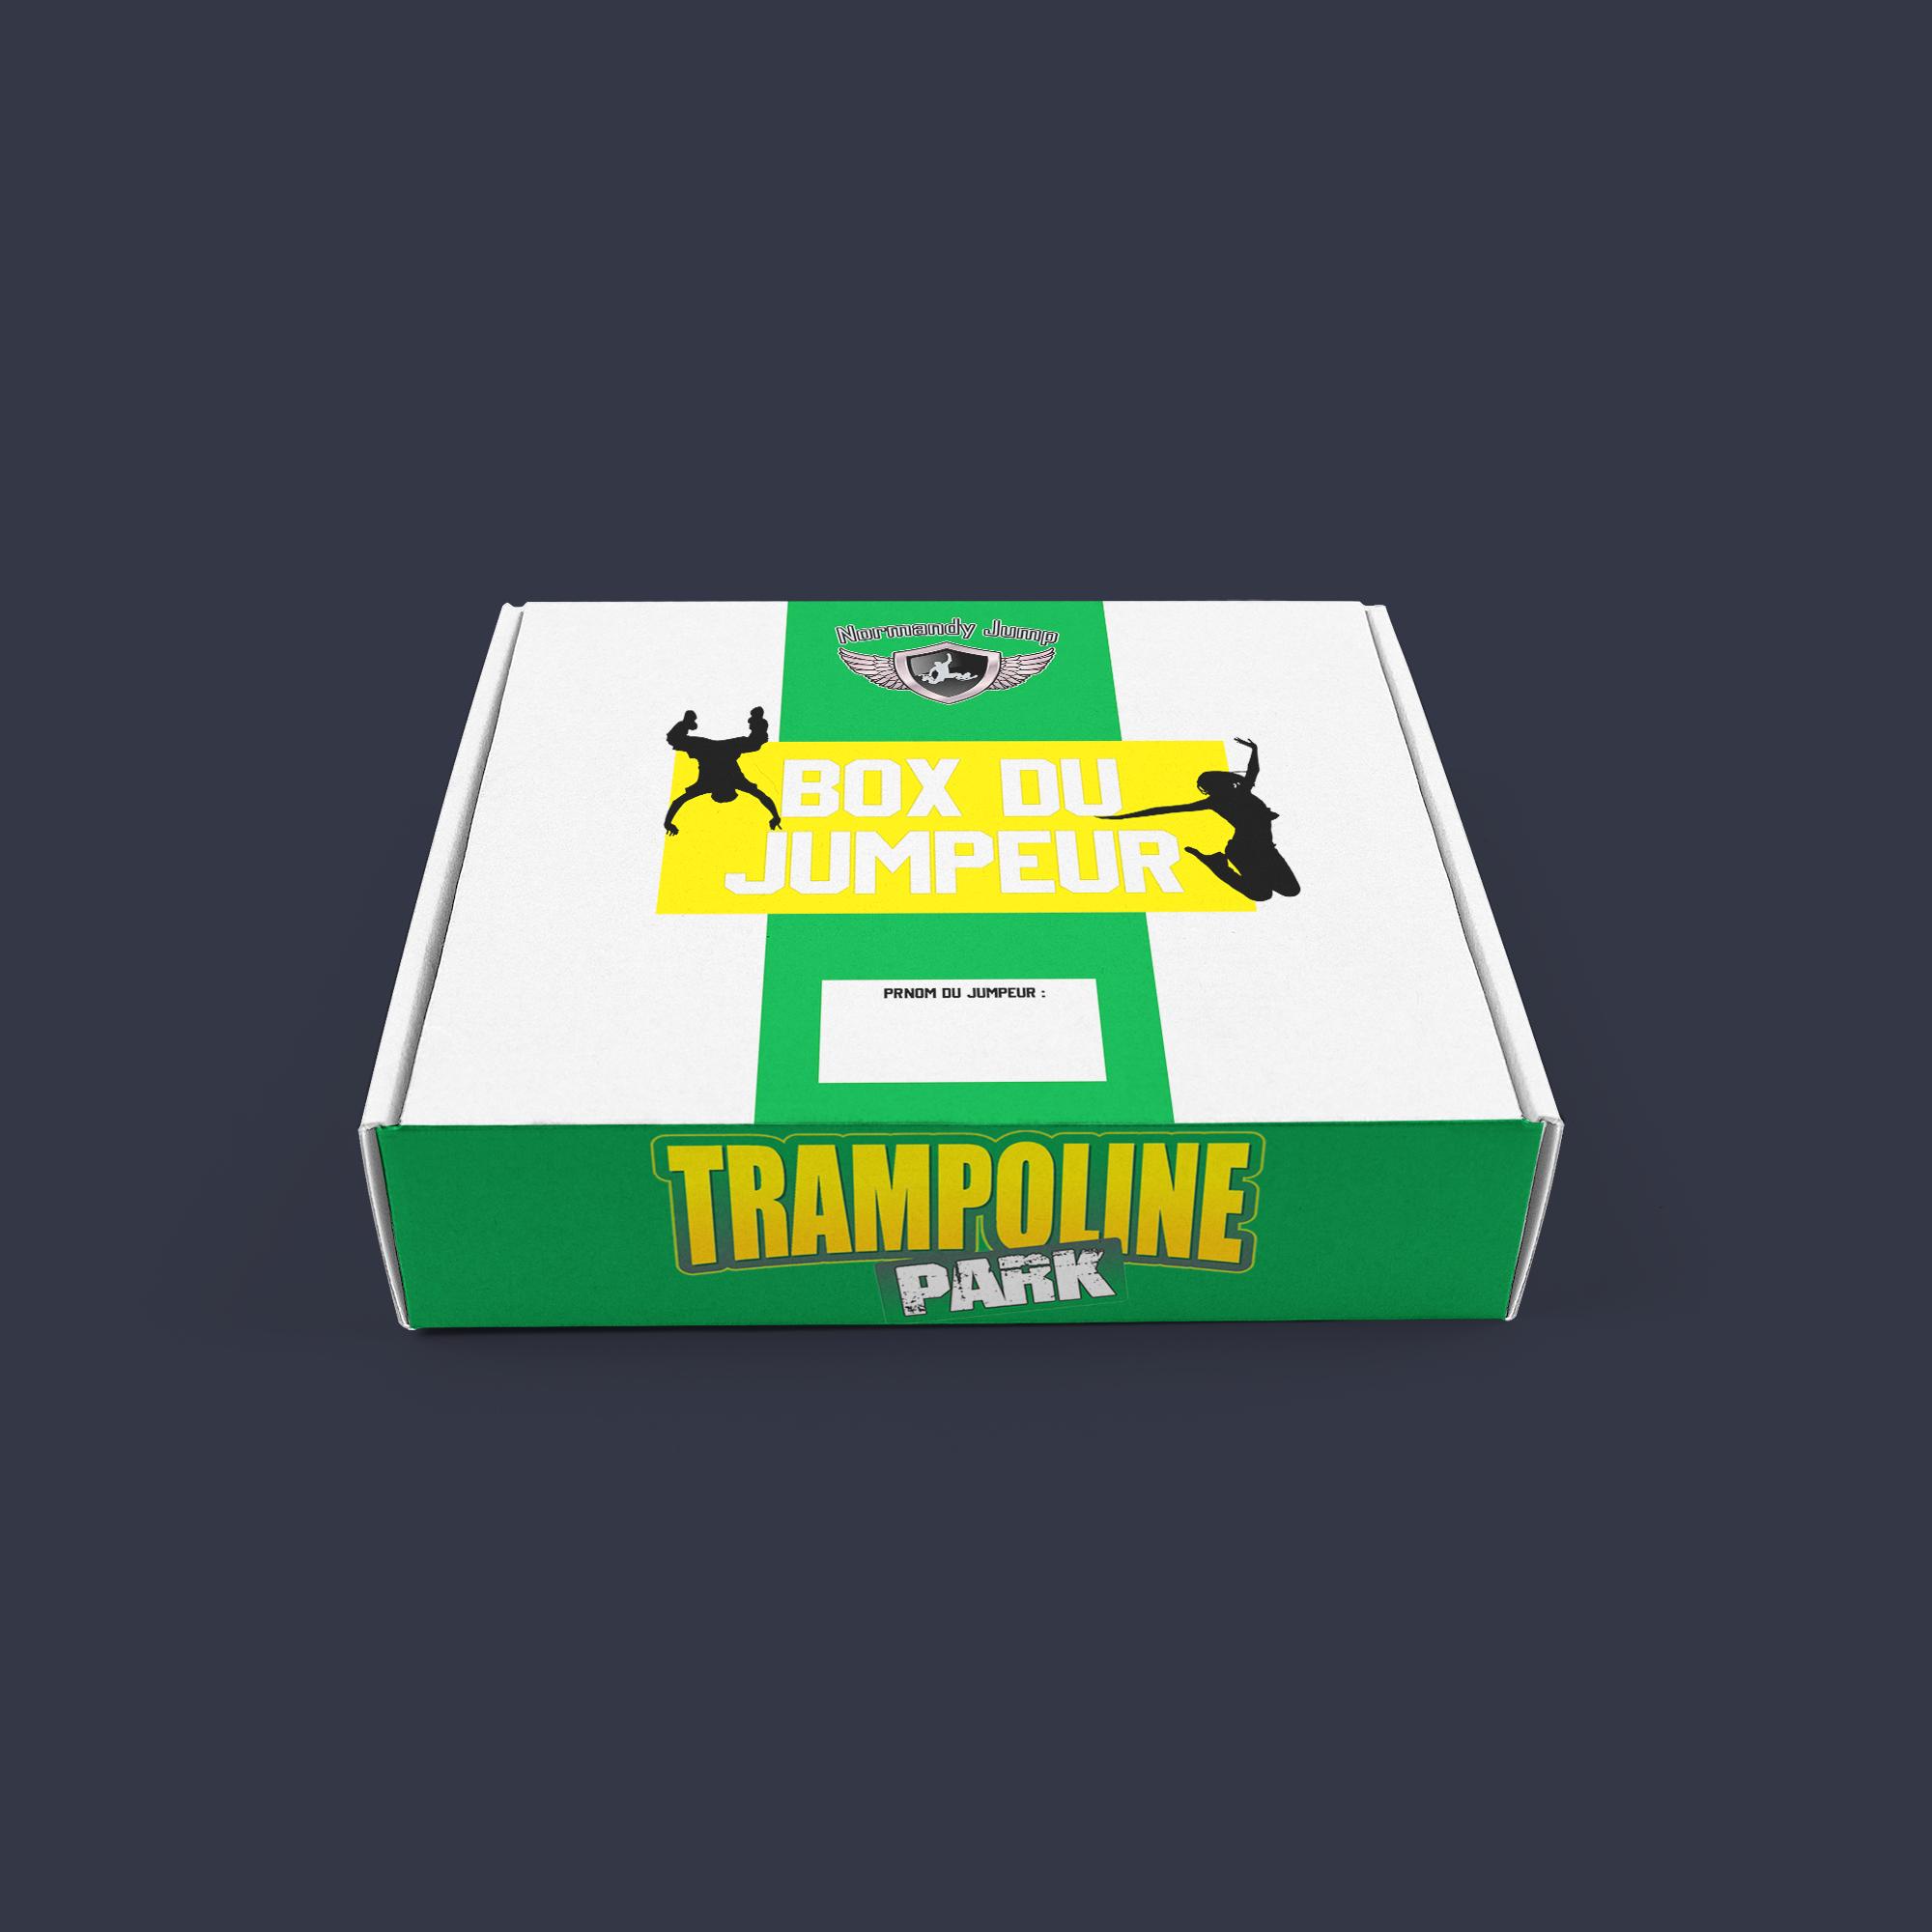 Box trampoline park normandy jump